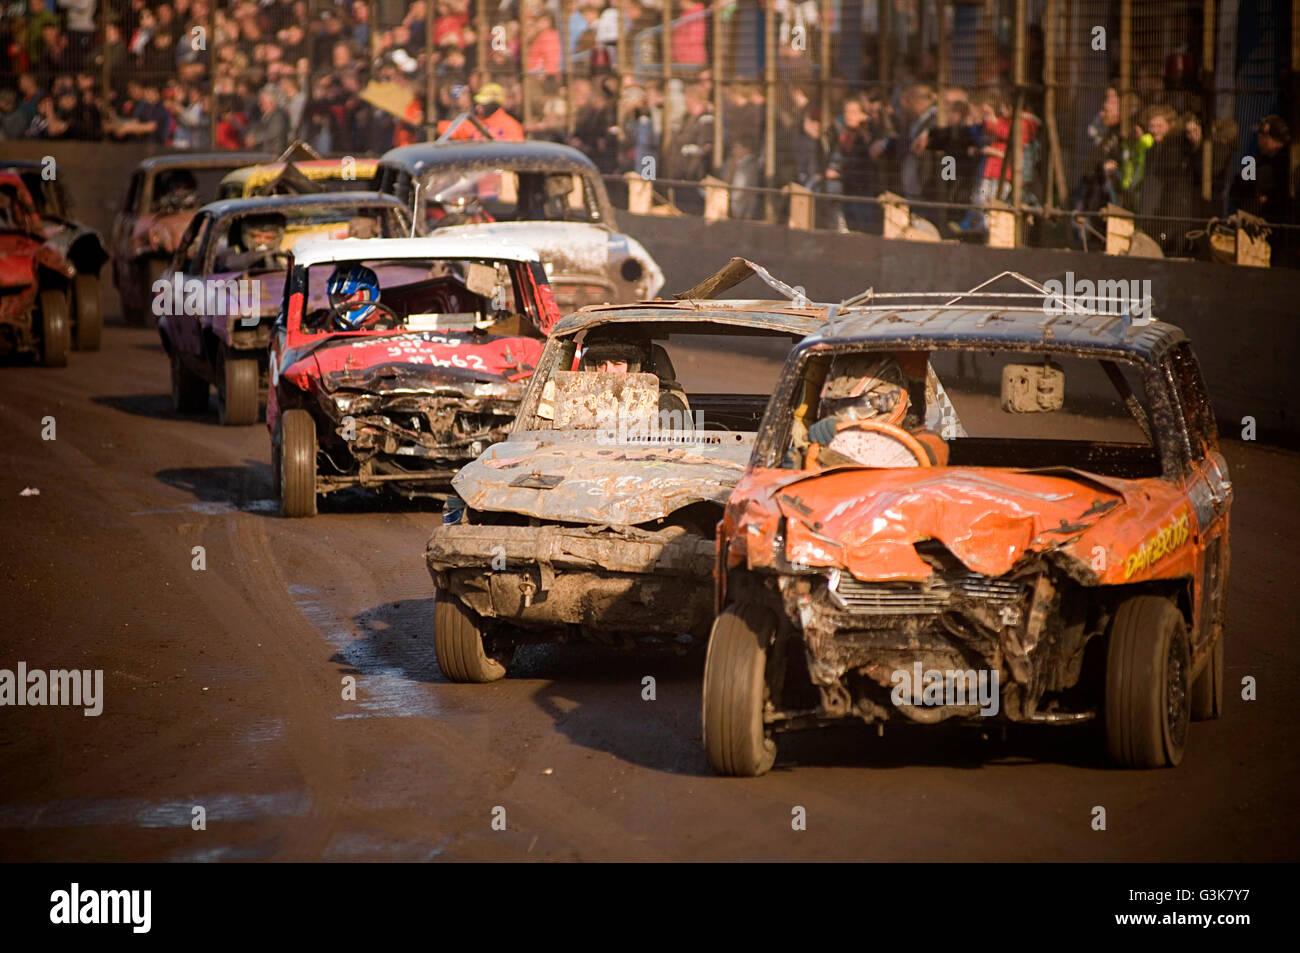 banger racing stock car cars race races old junk scrap old motor ...